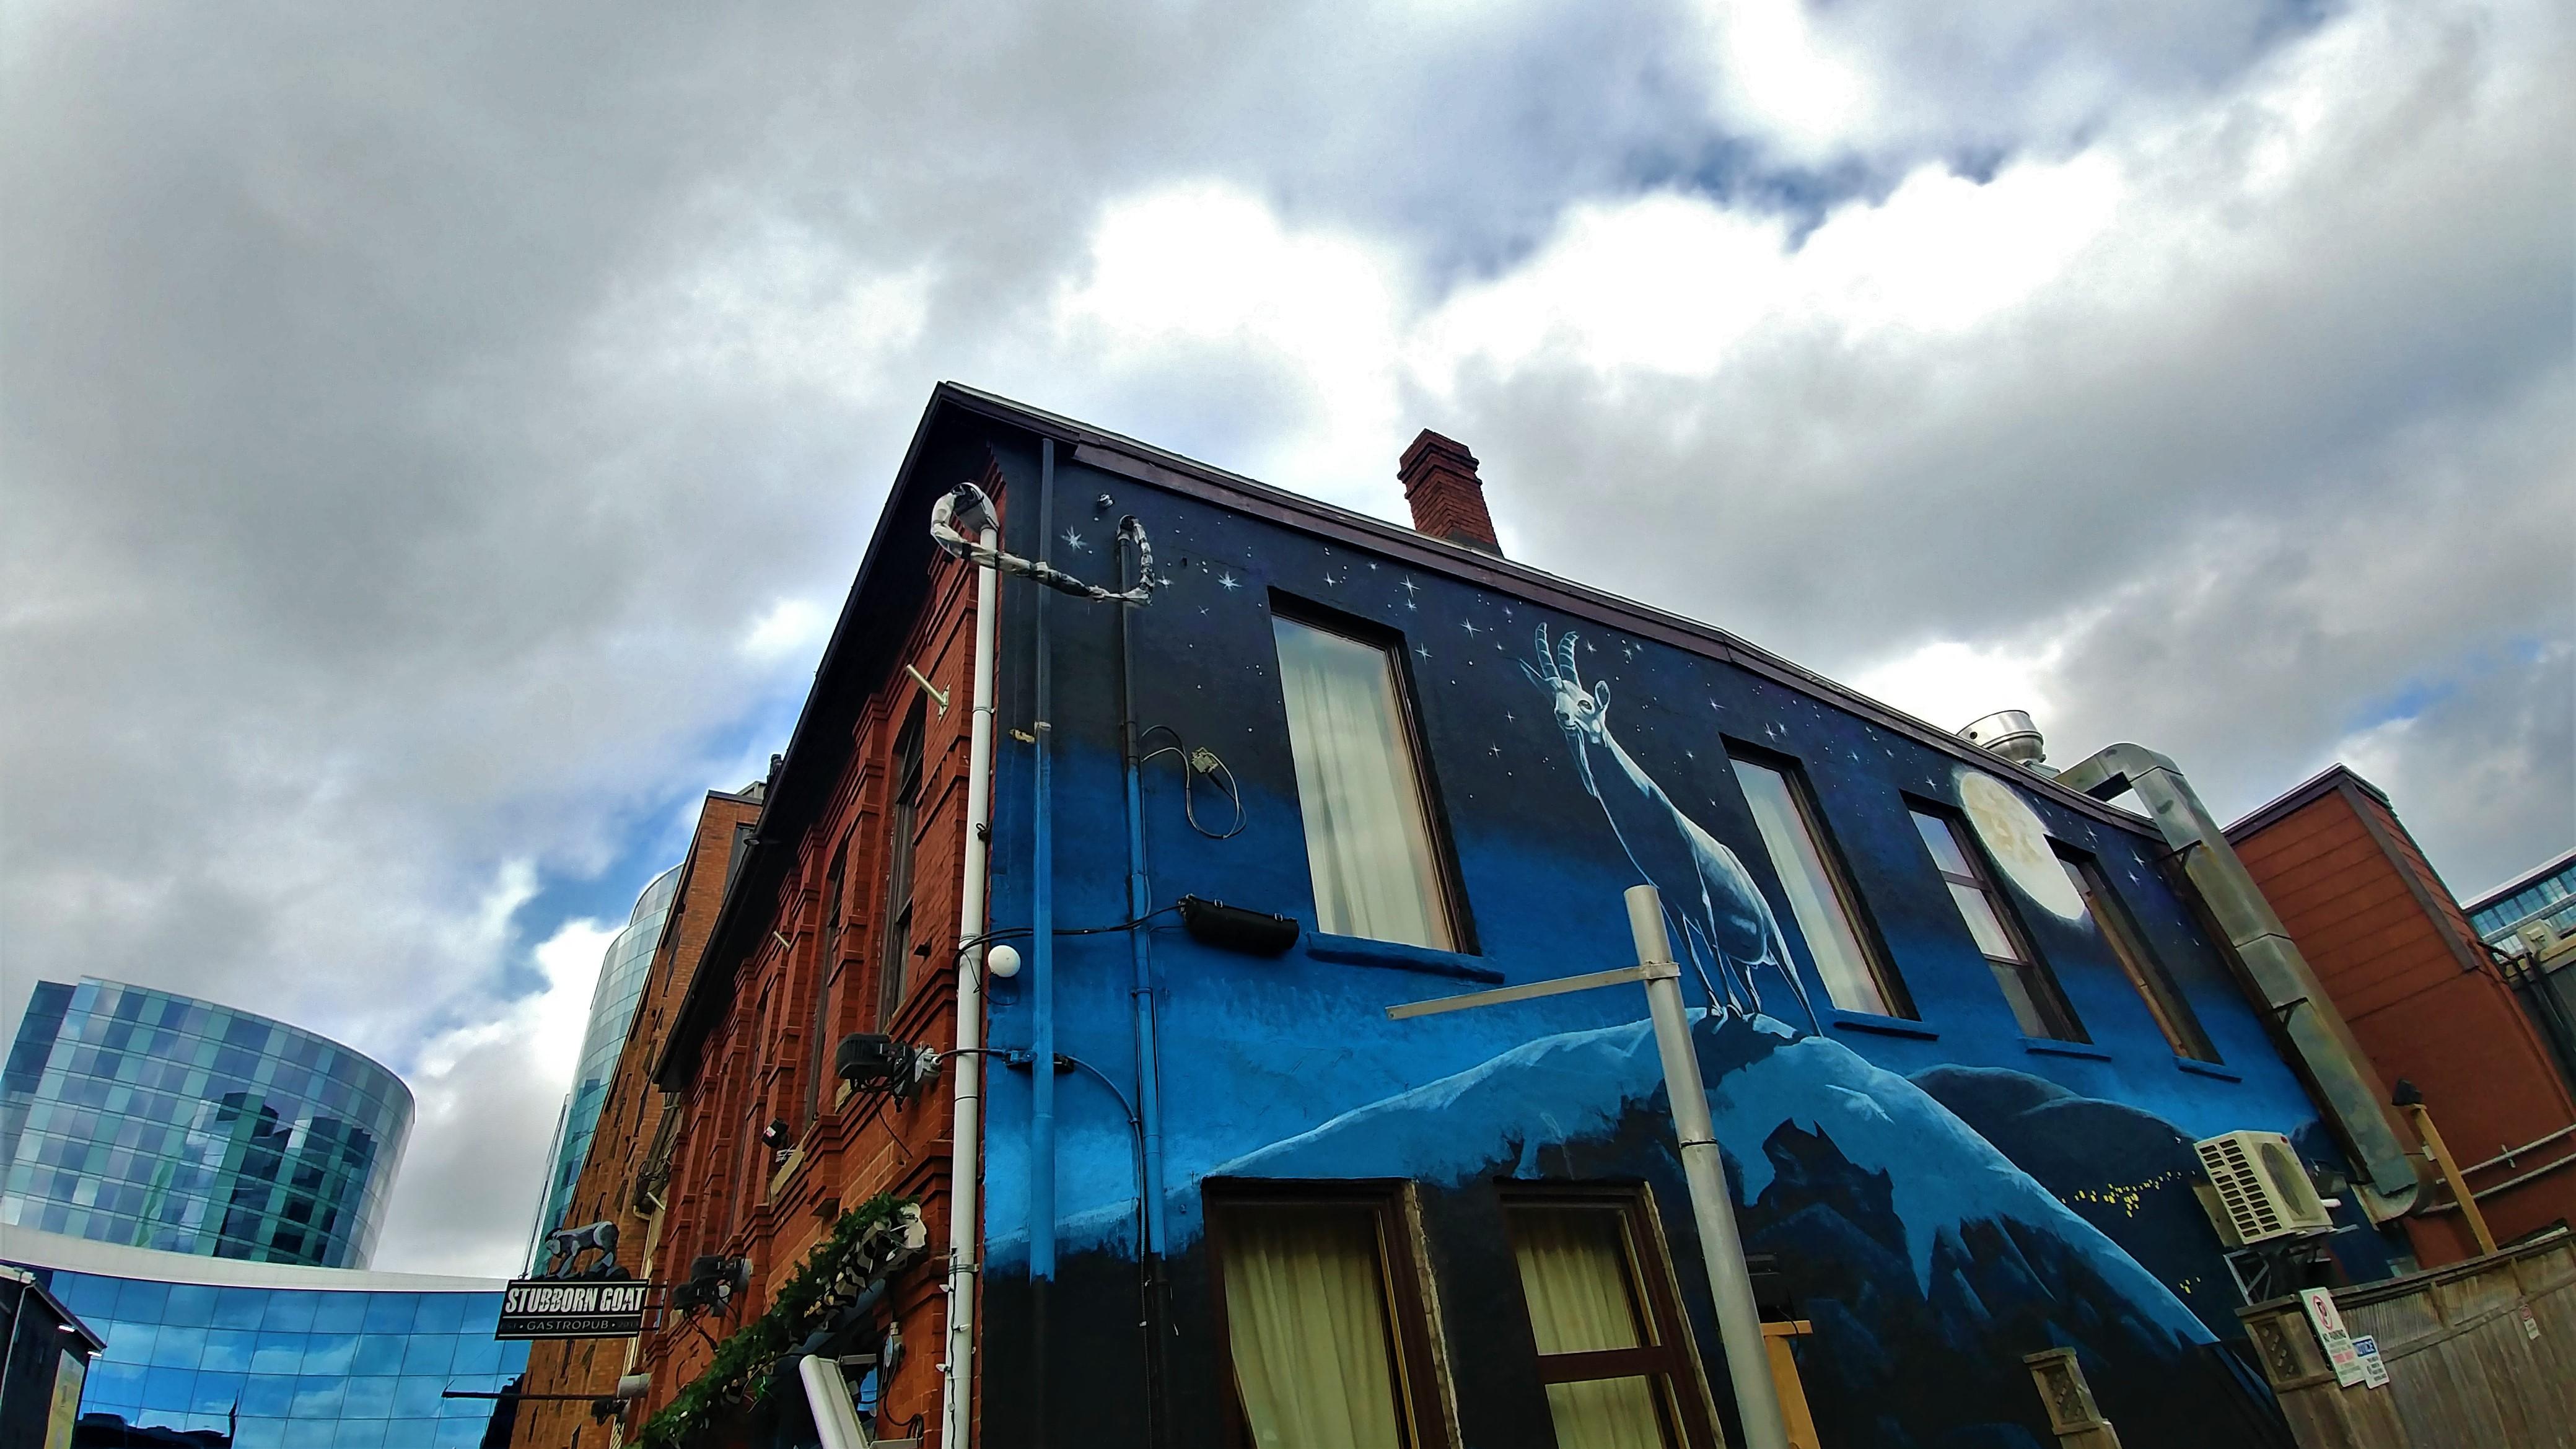 Halifax street art escapade que faire blog voyage canada maritimes arpenter le chemin